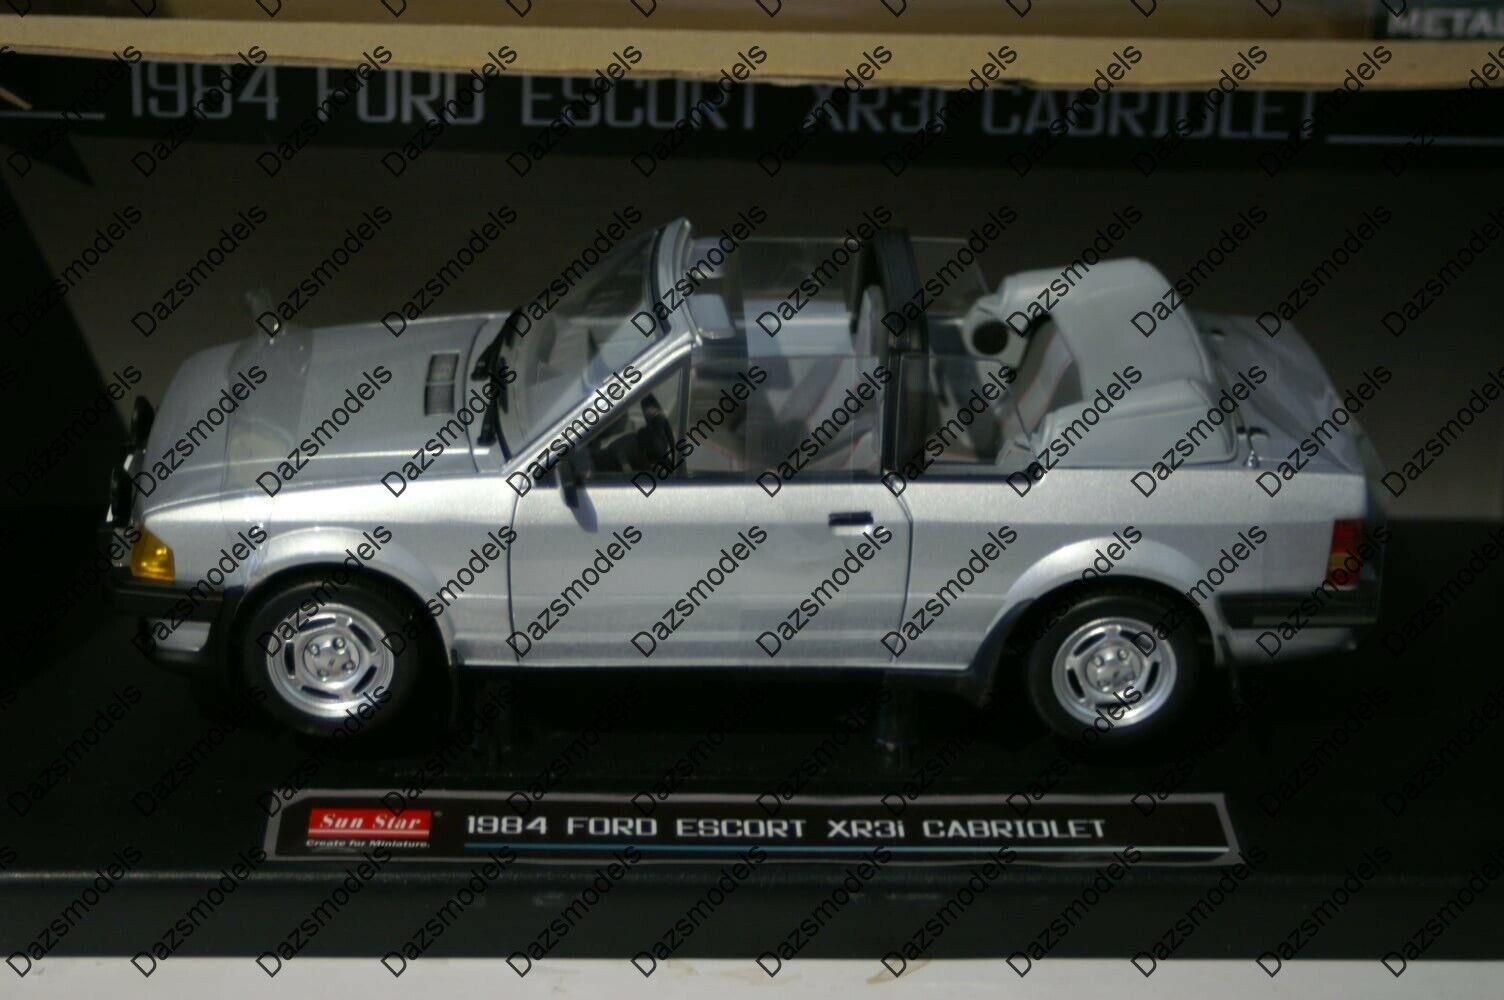 Sun star ford escort 1984 XR3i cabriolet argent 4993 Diecast 2 portes échelle 1 18